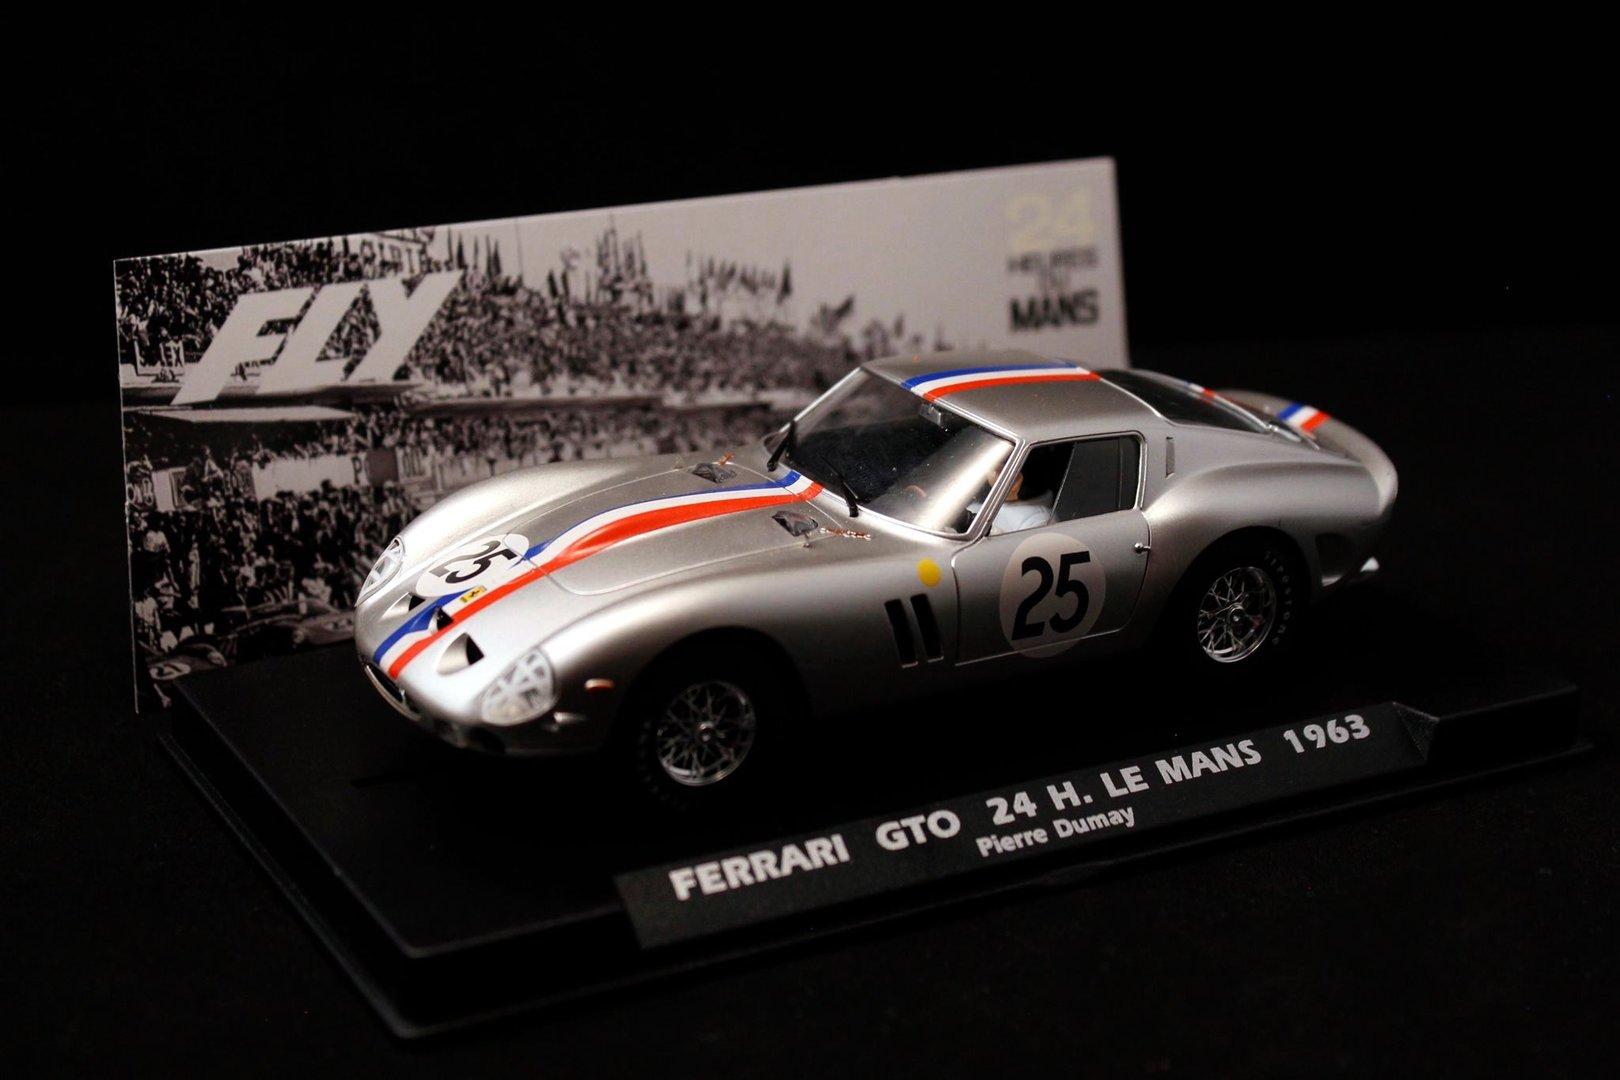 Ferrari 250 Gto Gris Le Mans 1963 Ref A2019 Fly